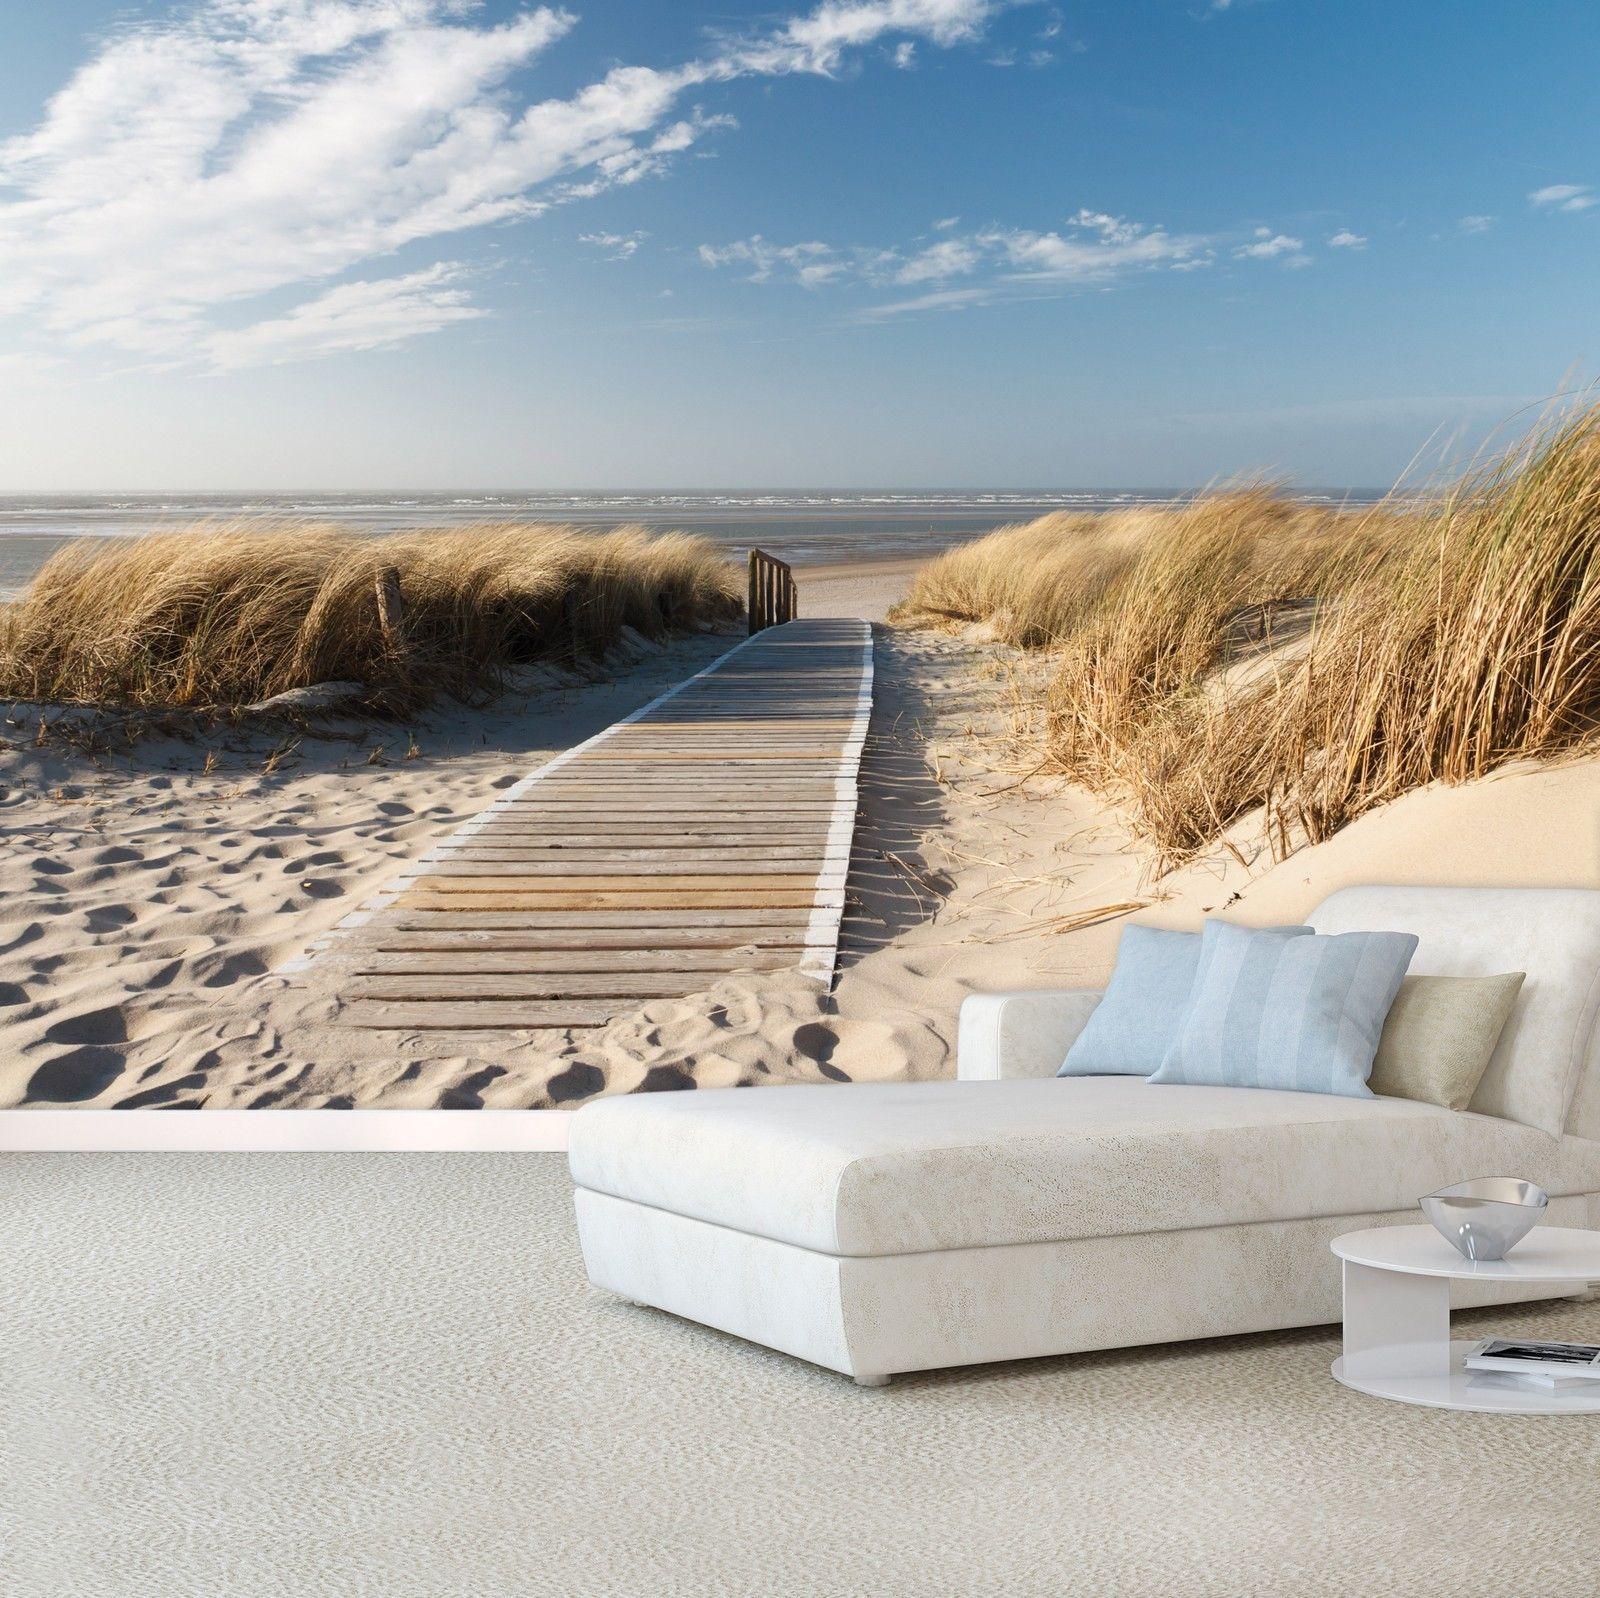 Fototapete ocean way 366x254cm tapete meer ozean strand - Wandgestaltung weiay ...